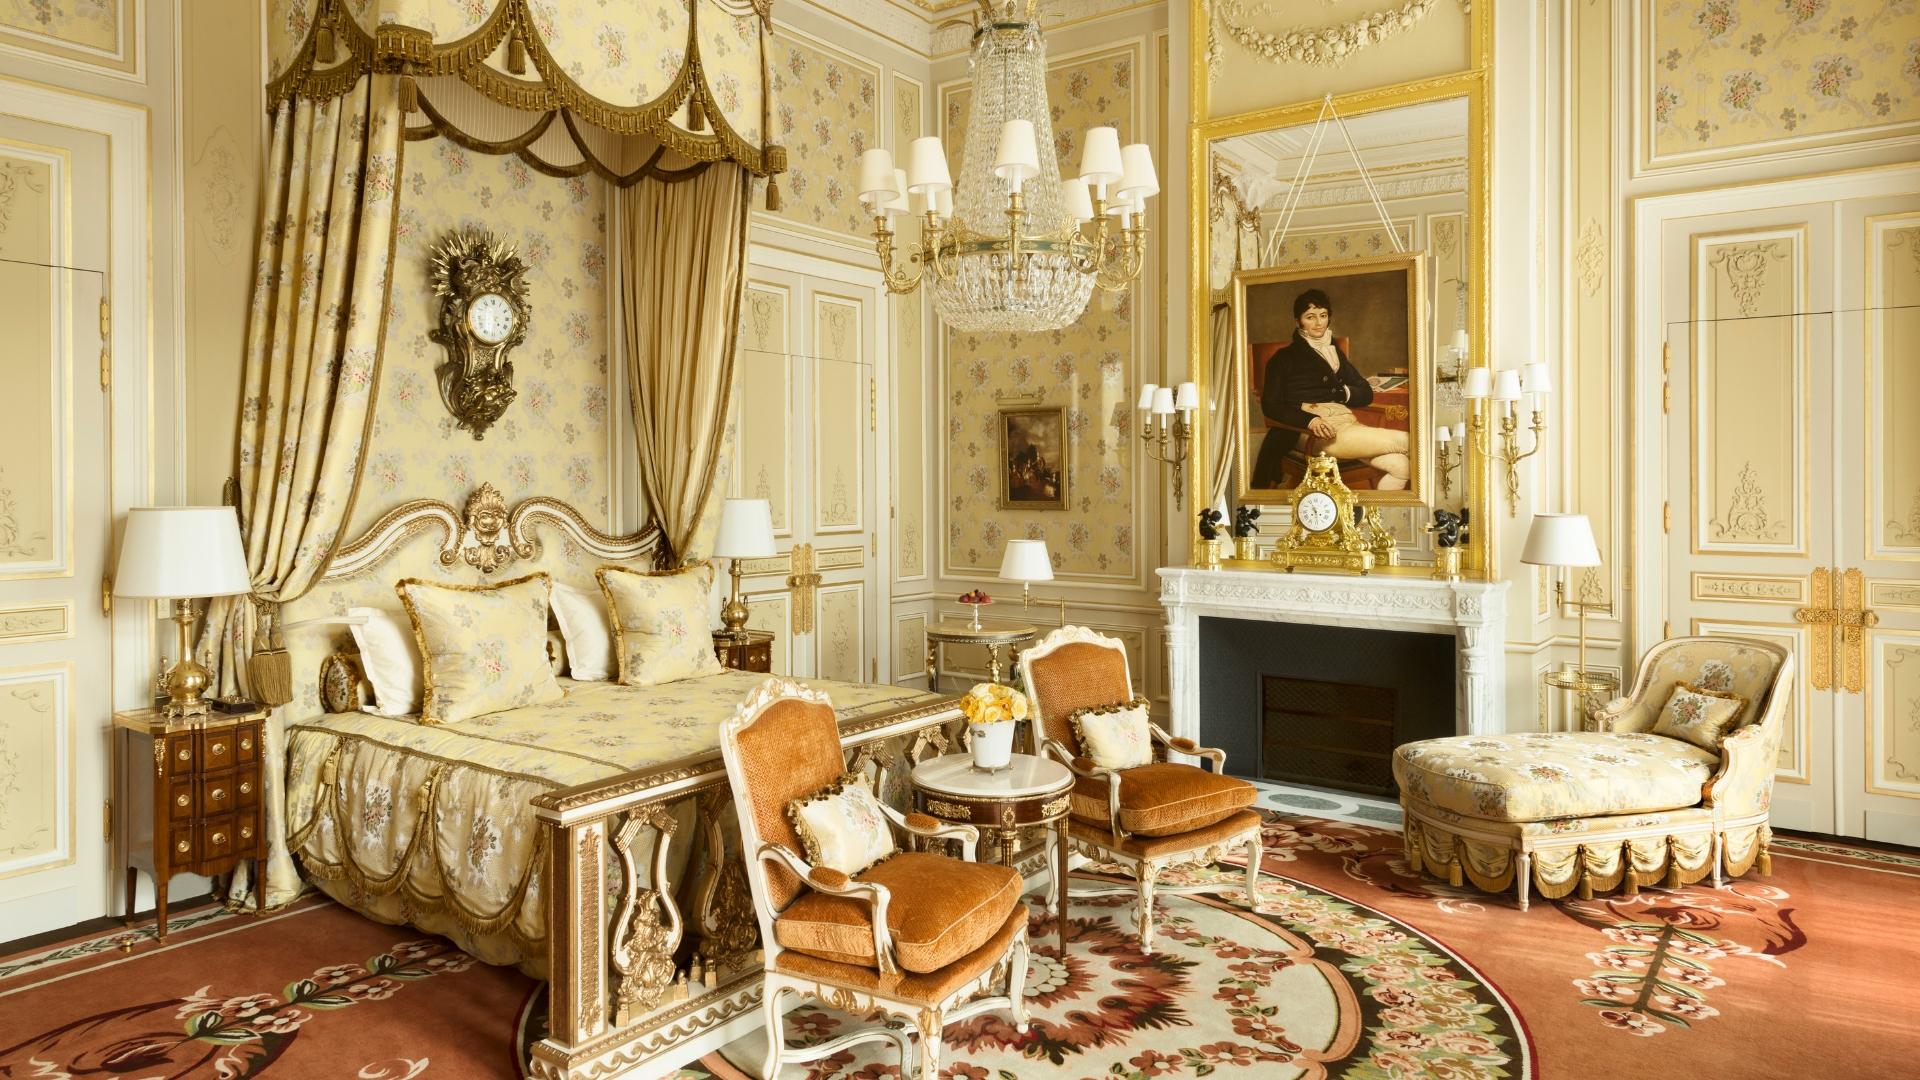 The Ritz Paris : A Grand Escape